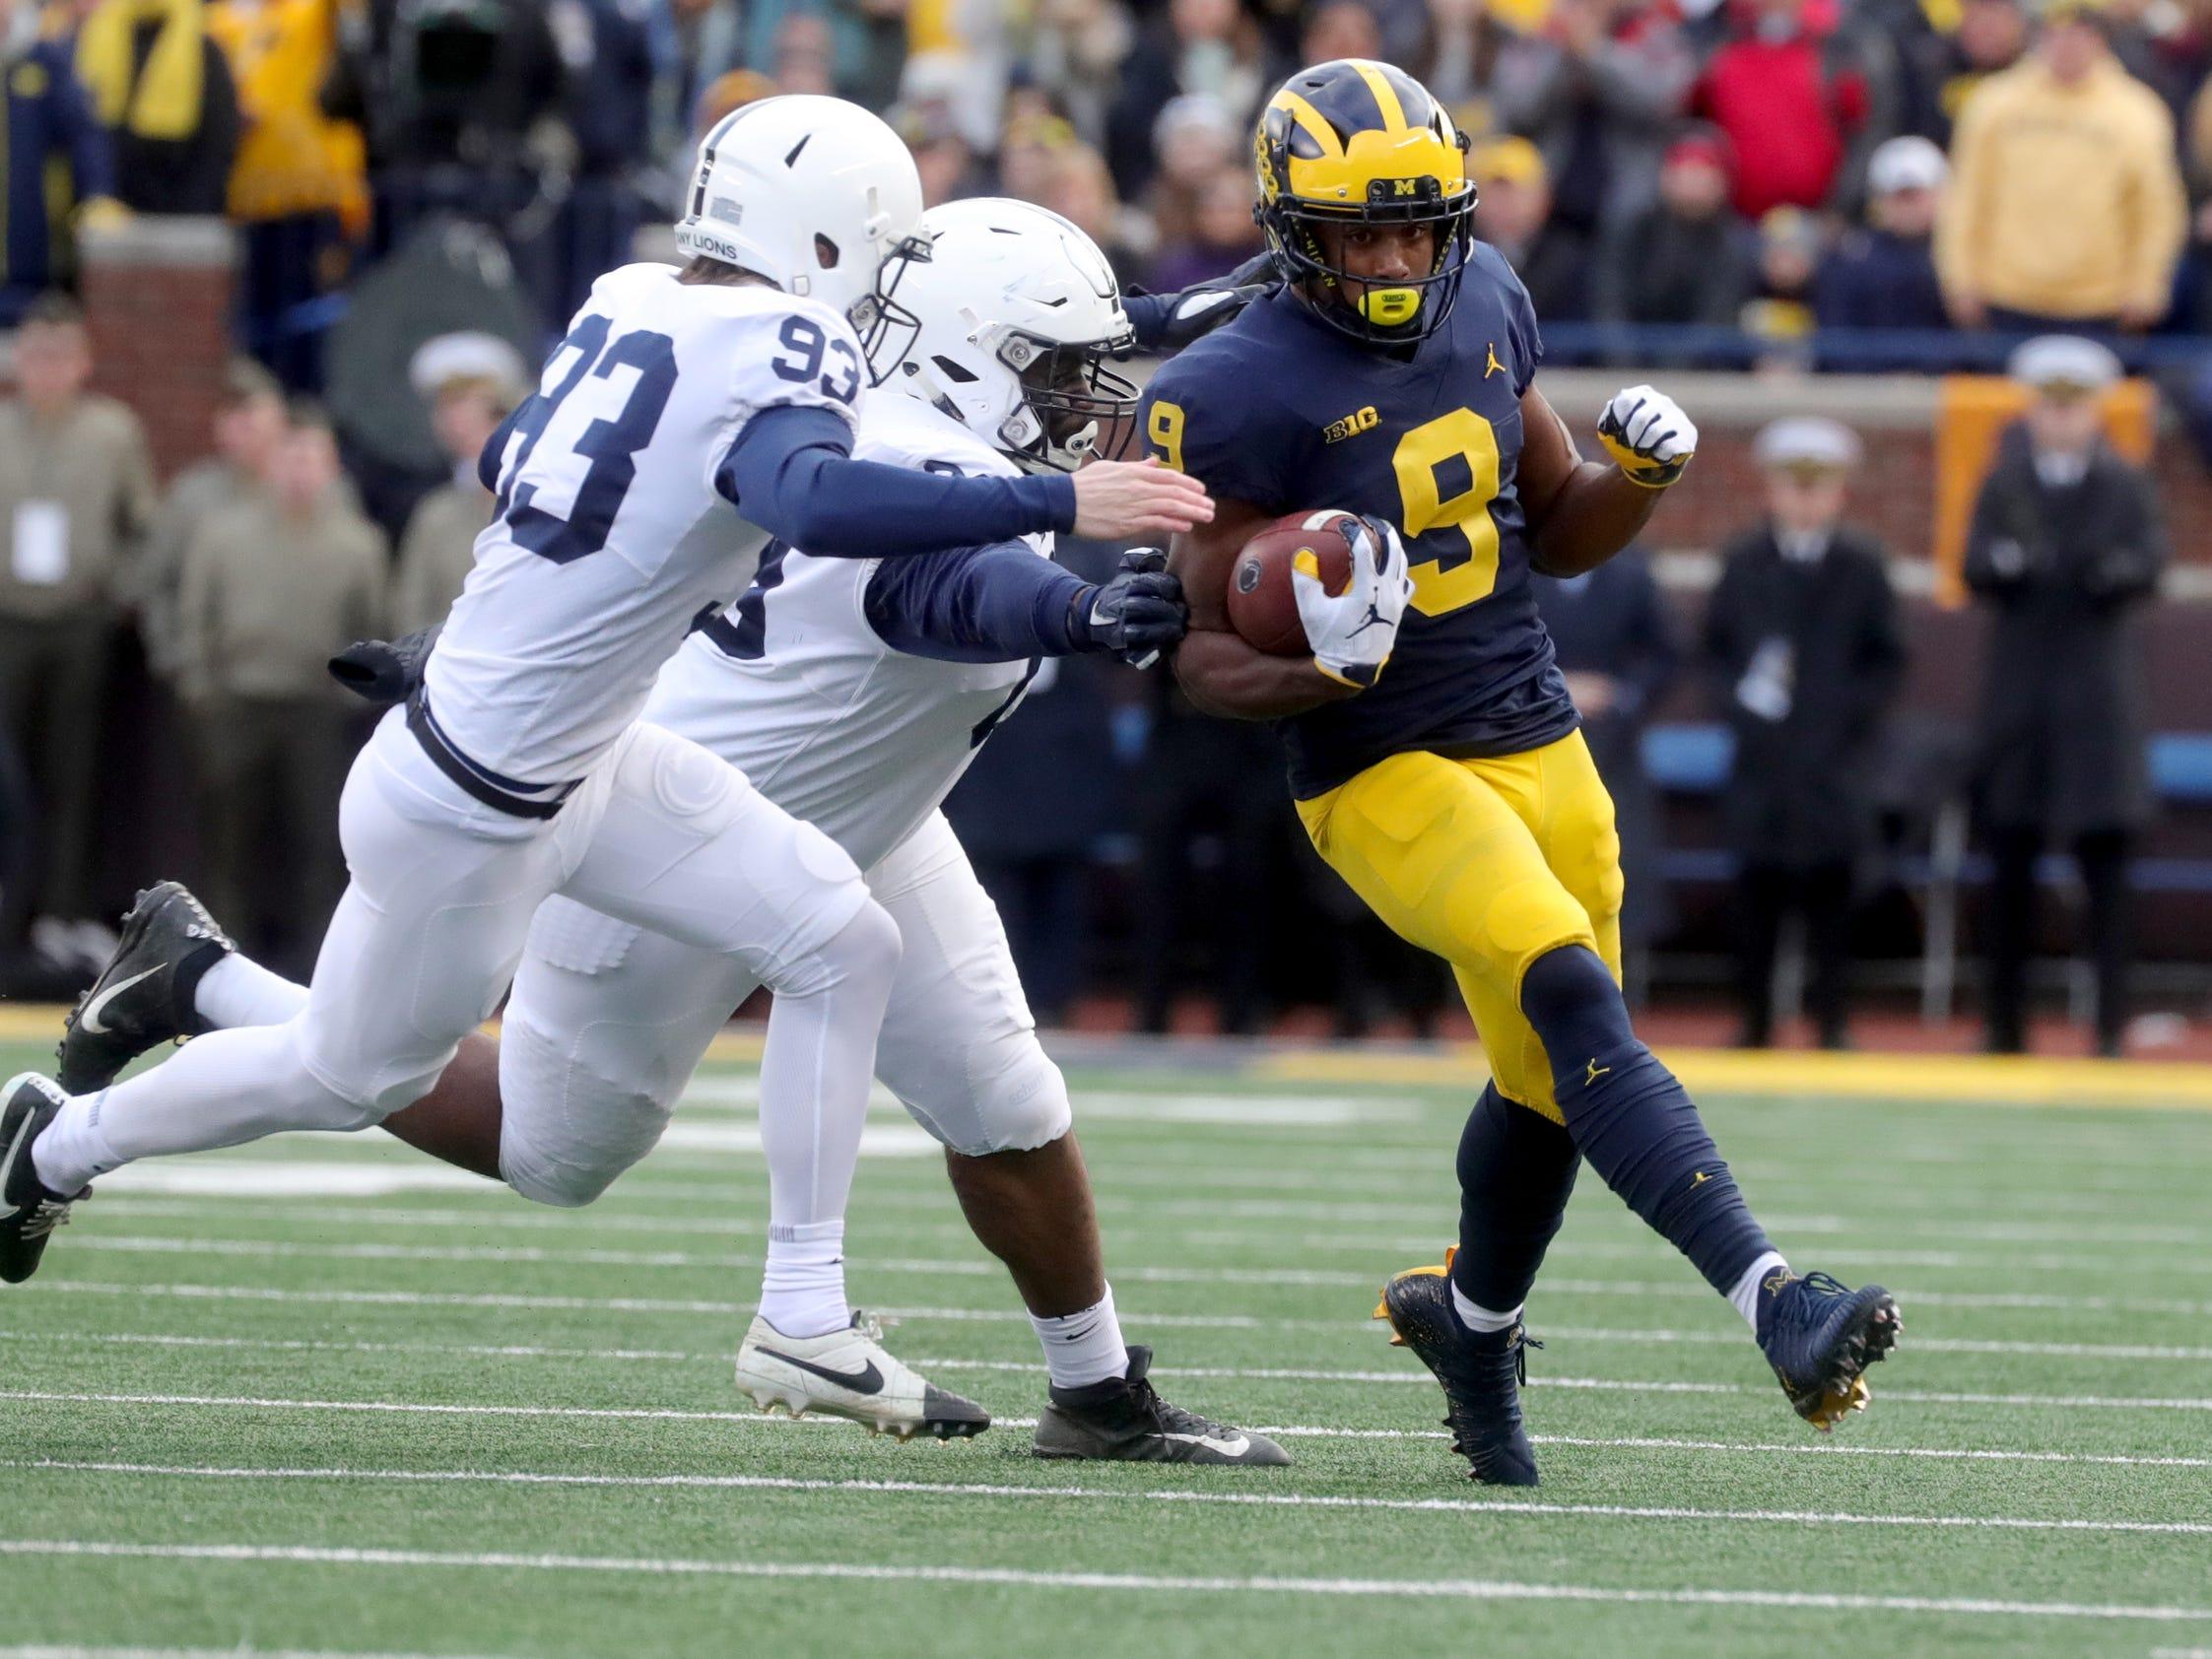 Michigan's Donovan Peoples-Jones runs for yardage against Penn State during the first half Saturday, November 3, 2018 at Michigan Stadium in Ann Arbor.